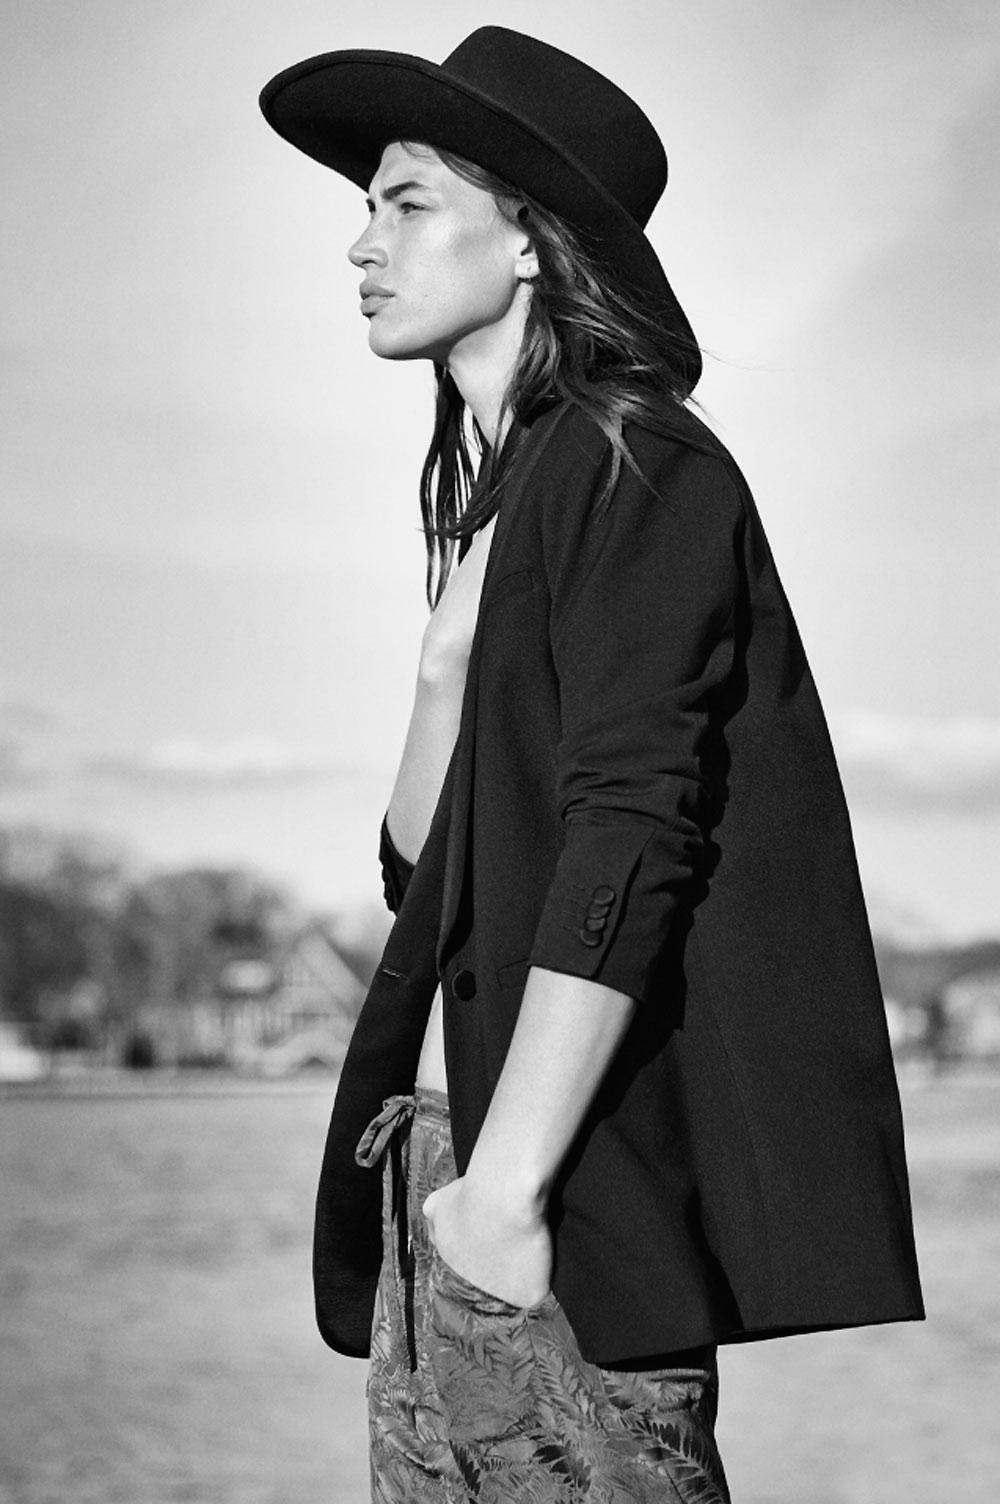 Cass, bird, crysta, crista, cover, model, photographer, fields, fashion, editorial, oracle, fox